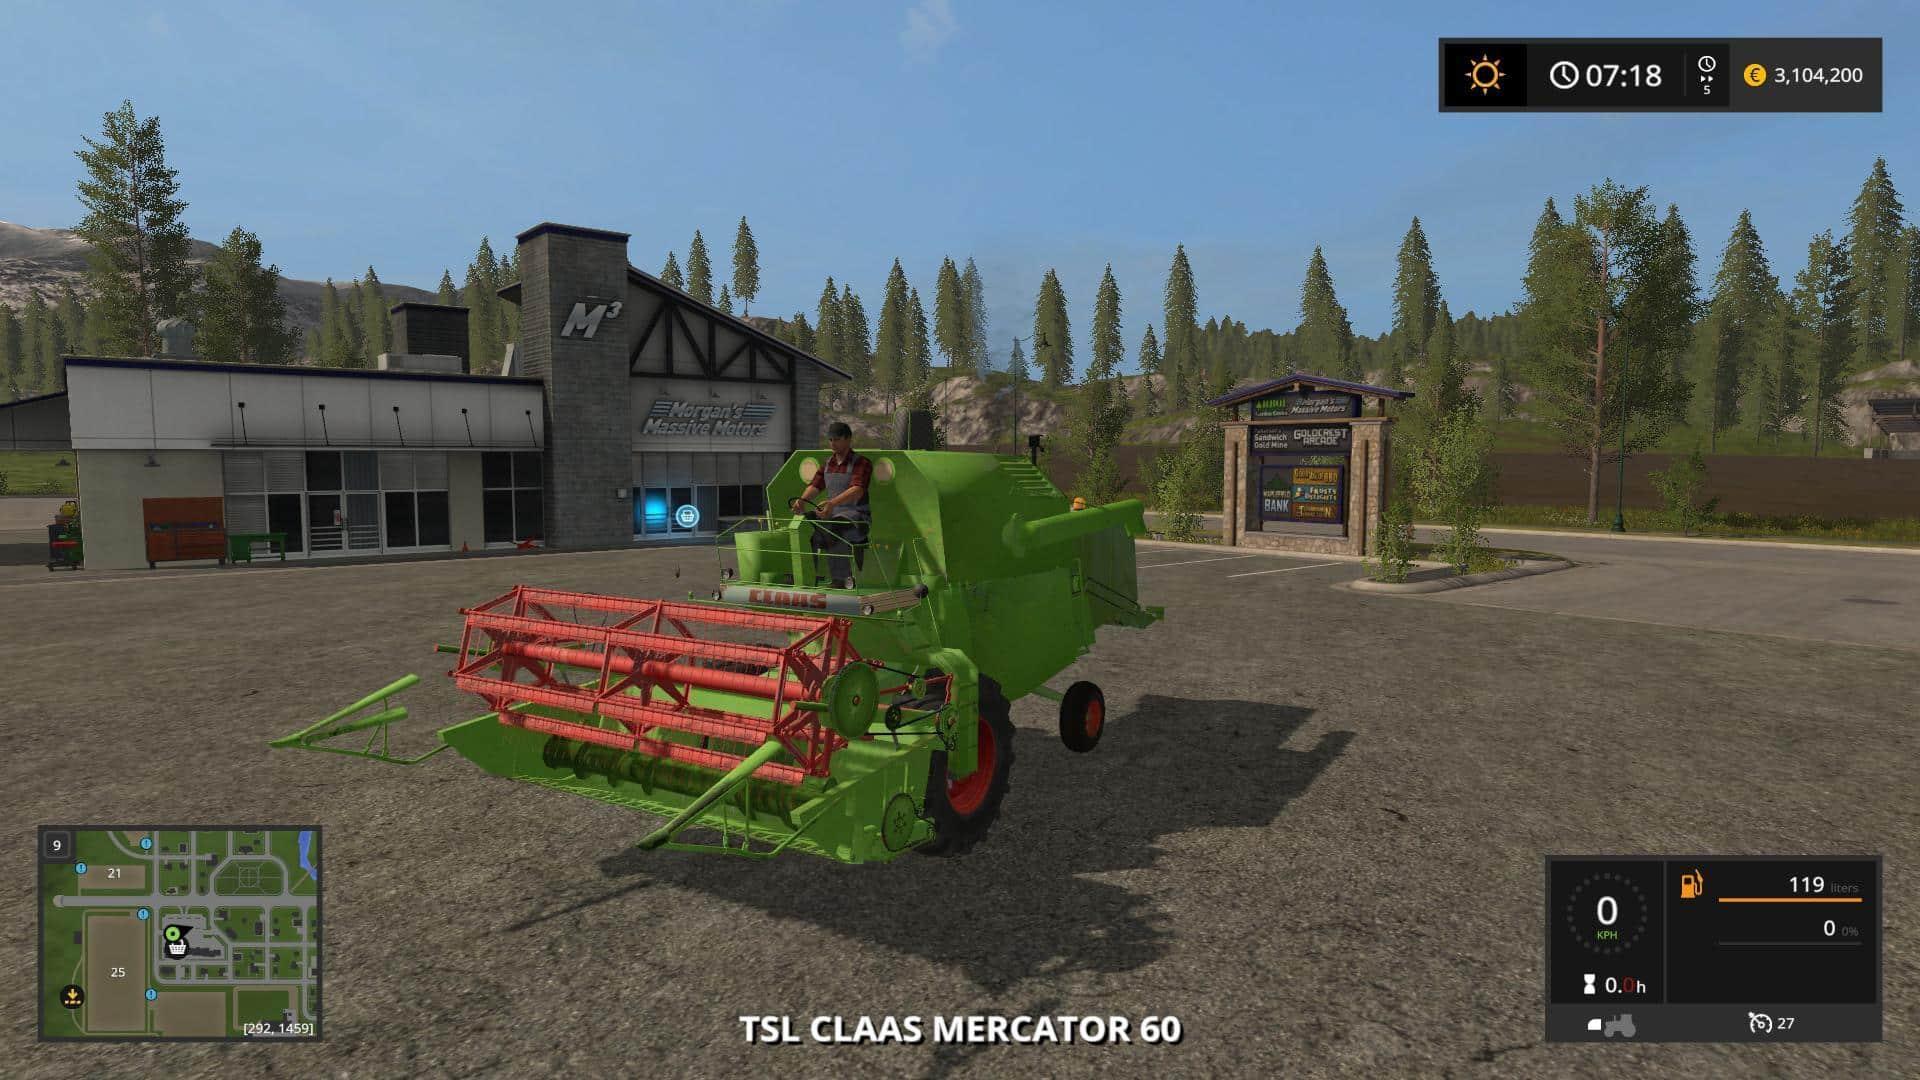 TSL Claas Mercator 60 v1.0